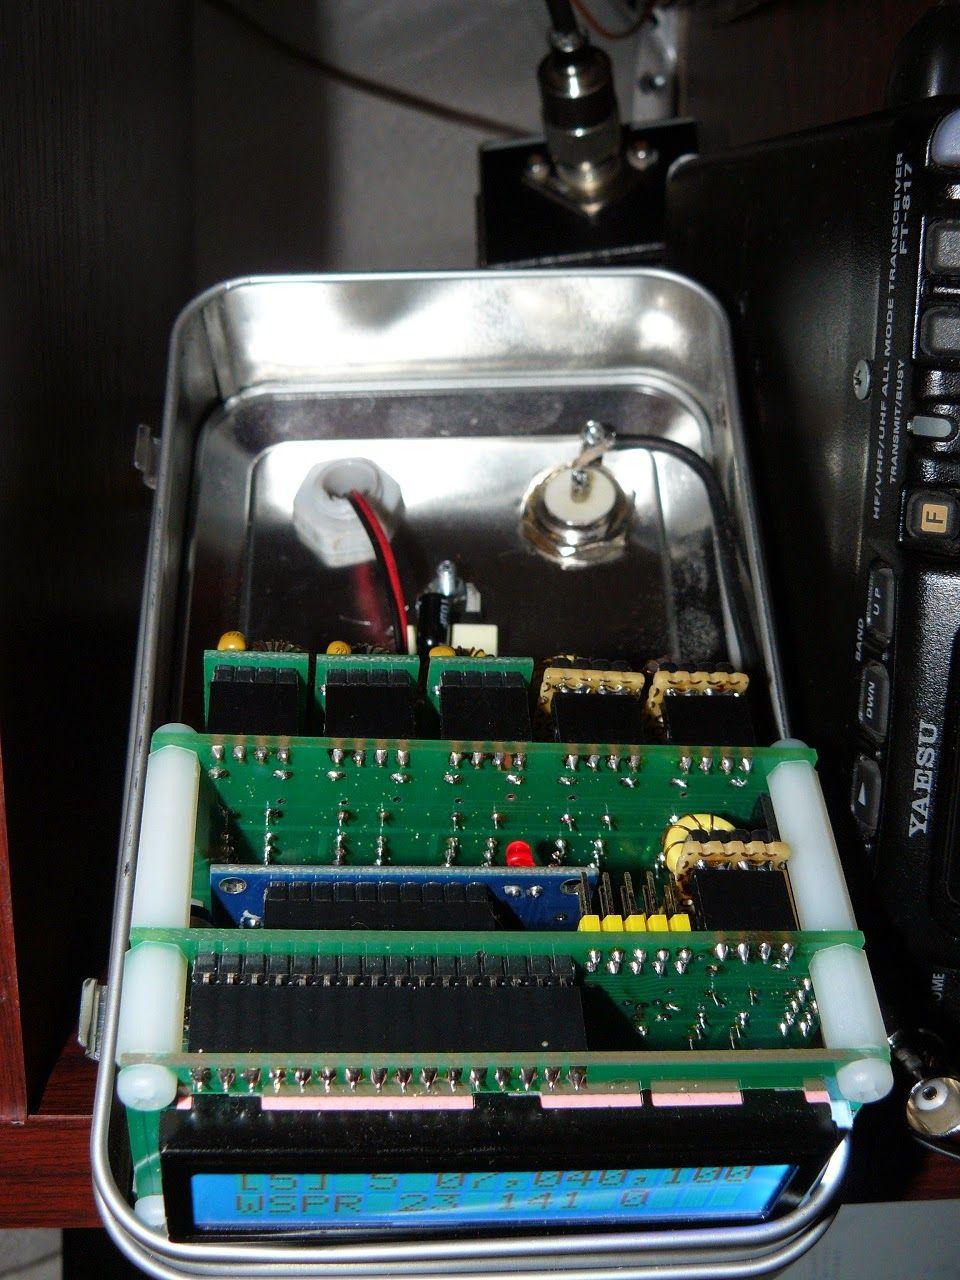 YO9IRF: Testing the Ultimate 3 WSPR beacon | Ham radio | Ham radio, Ham